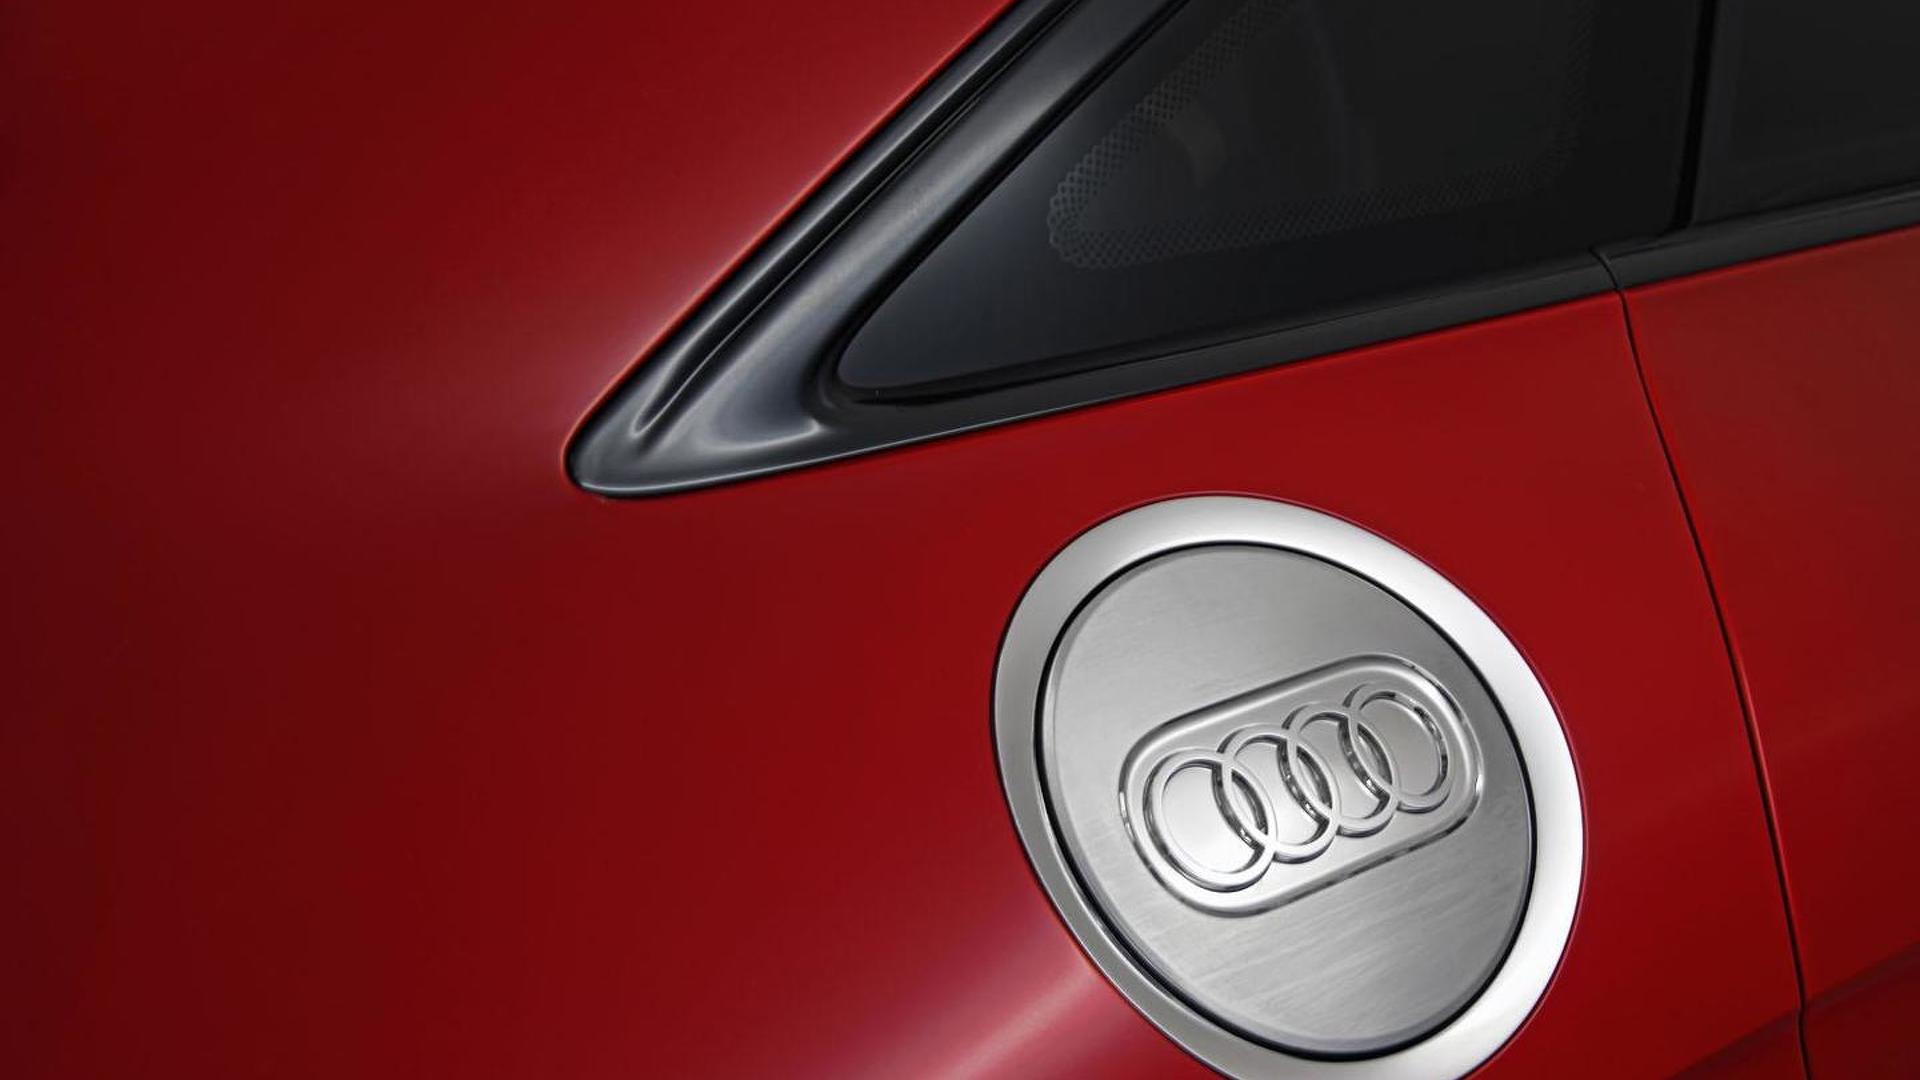 Крышка бака Audi TT Sportback Concept